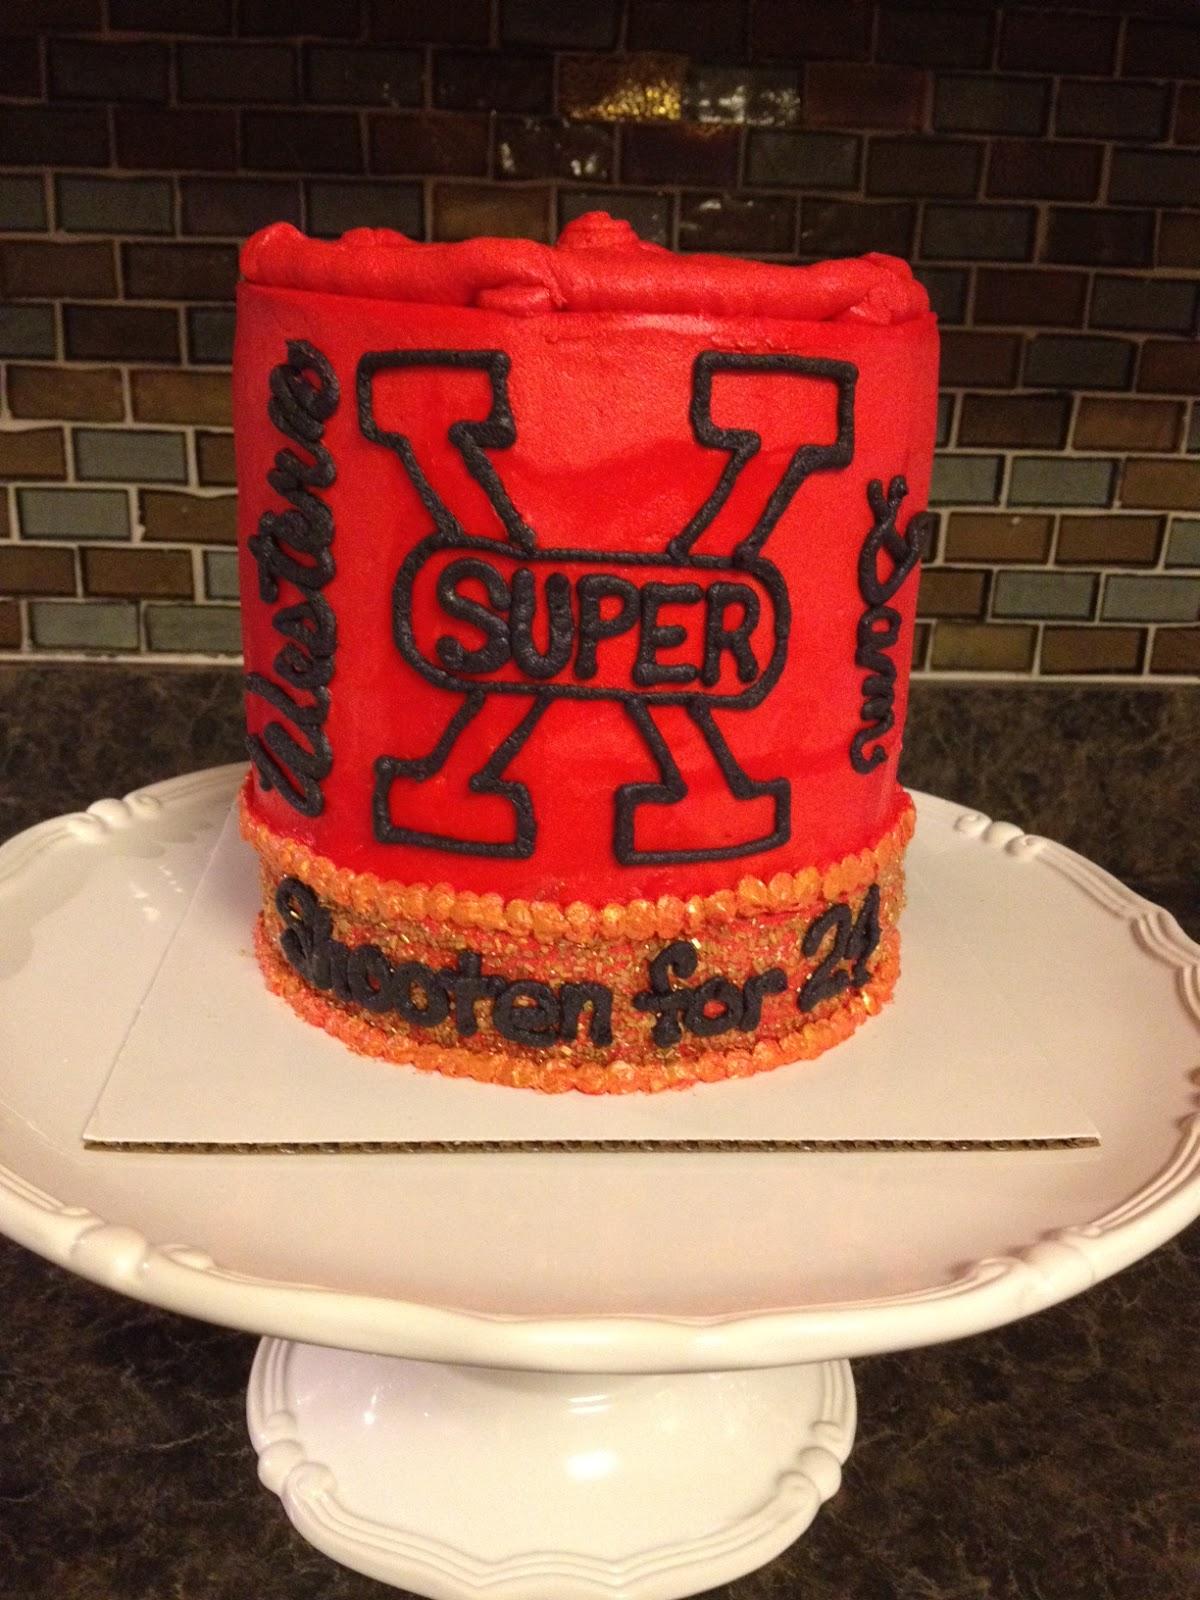 Sisters Baking Co Shotgun Shell 24th Birthday Cake